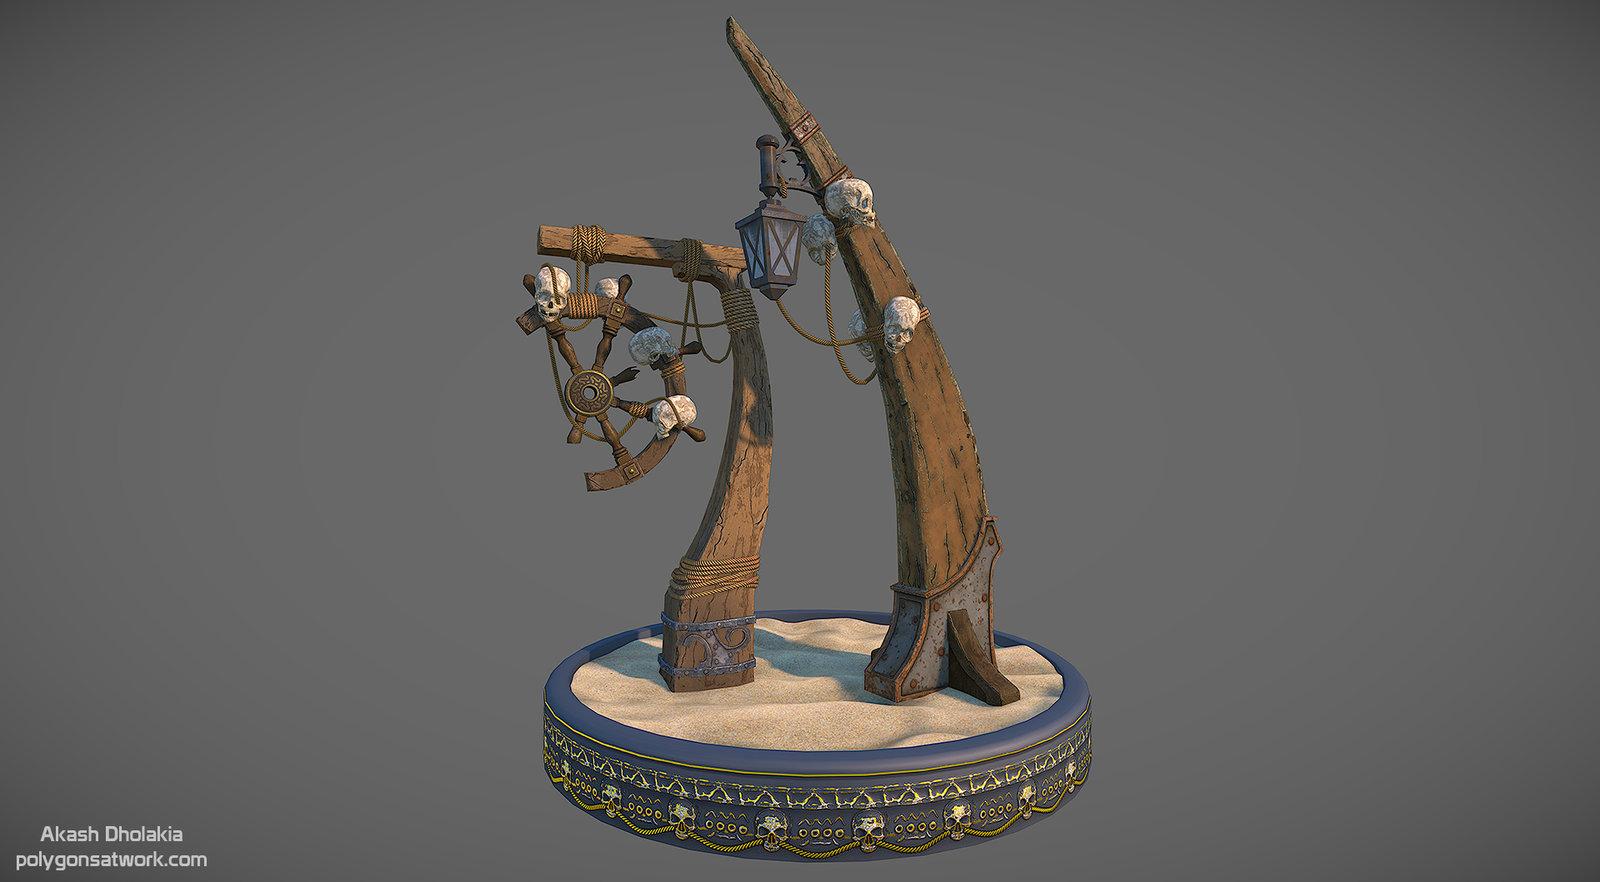 Pirate_Post_02